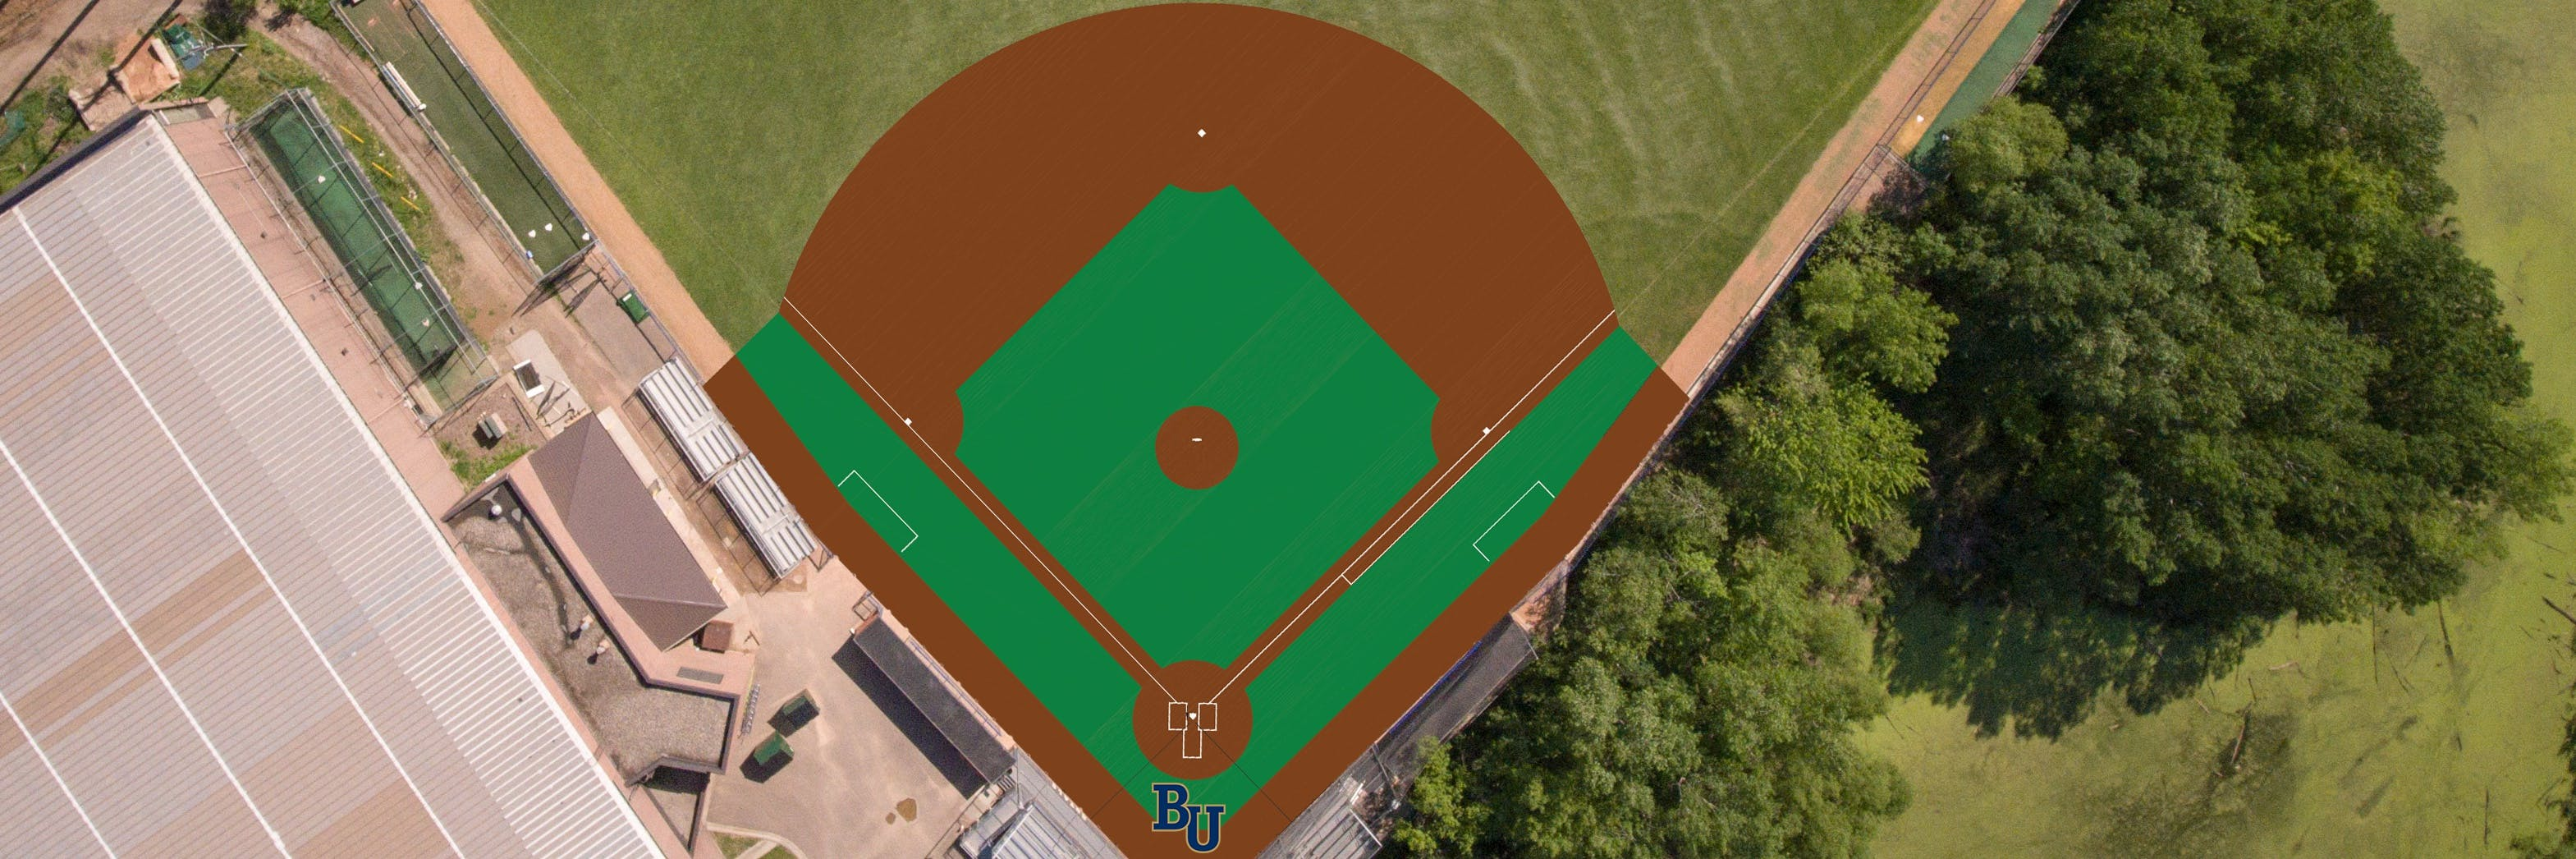 Baseball Turf Infield